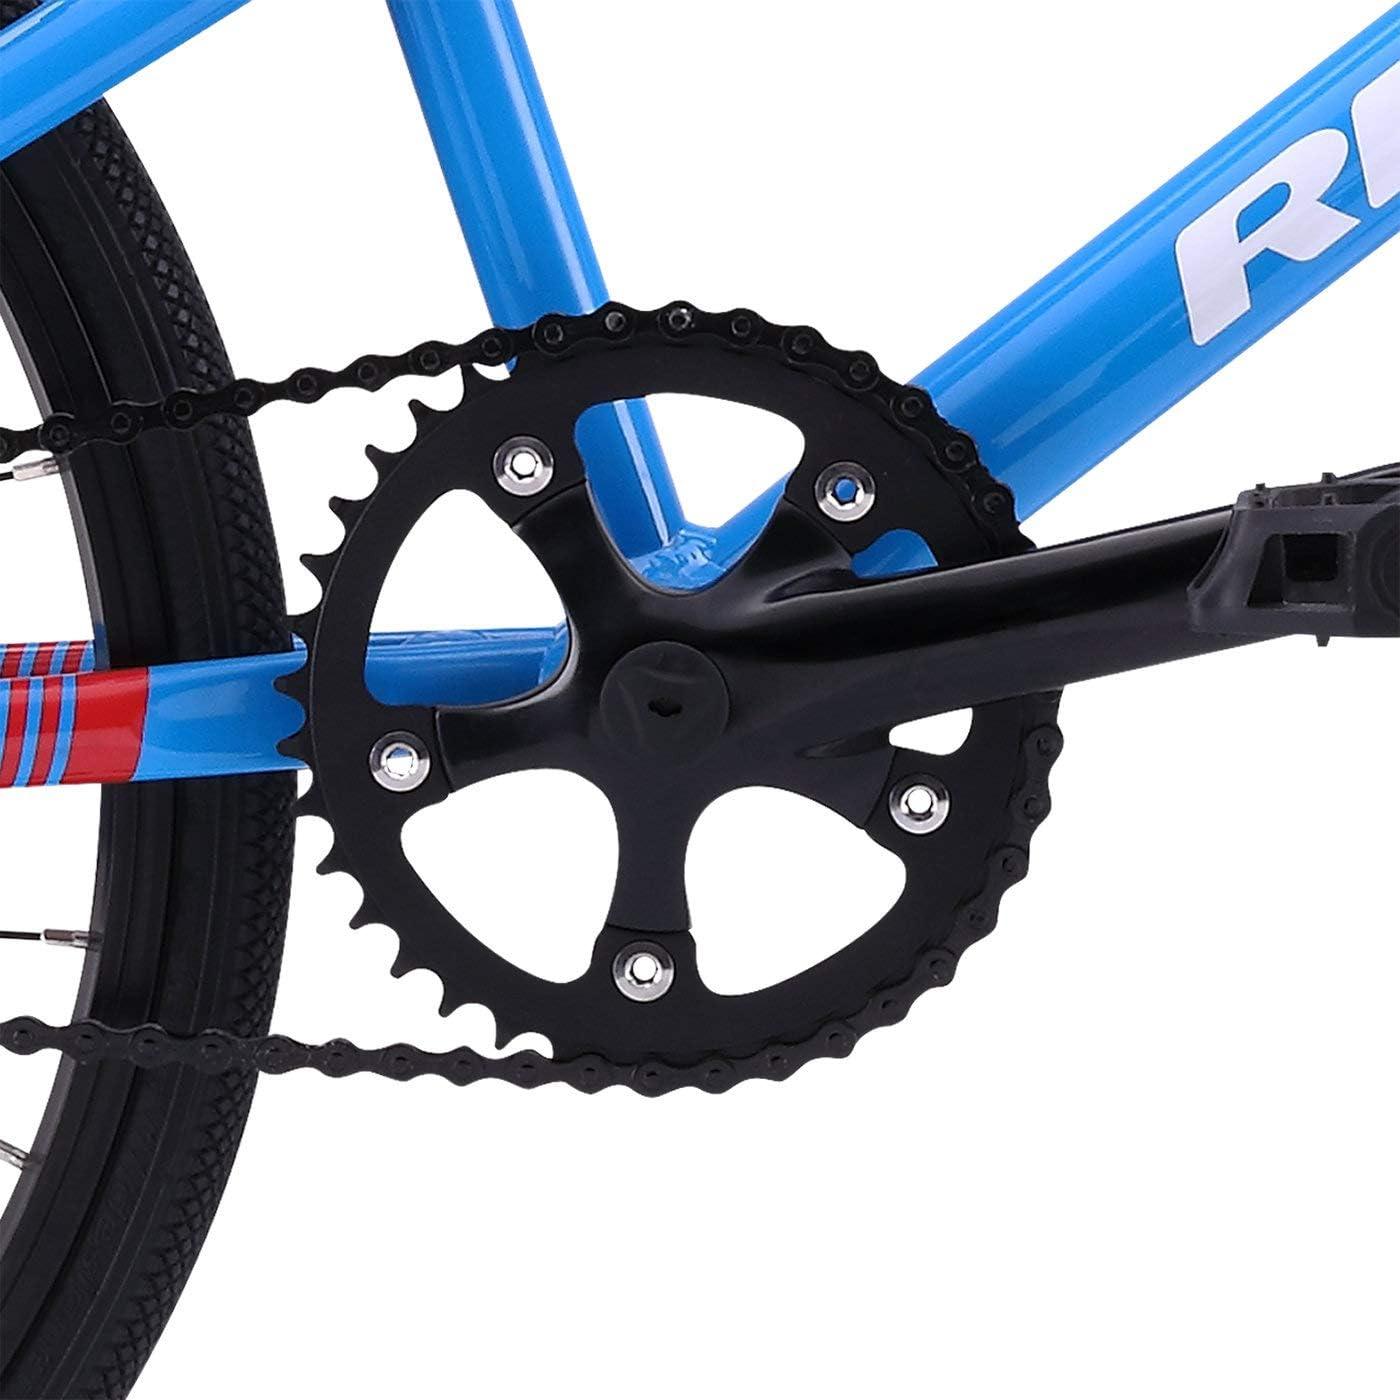 Redline Bikes Mx Bmx Race Bike Bmx Bikes